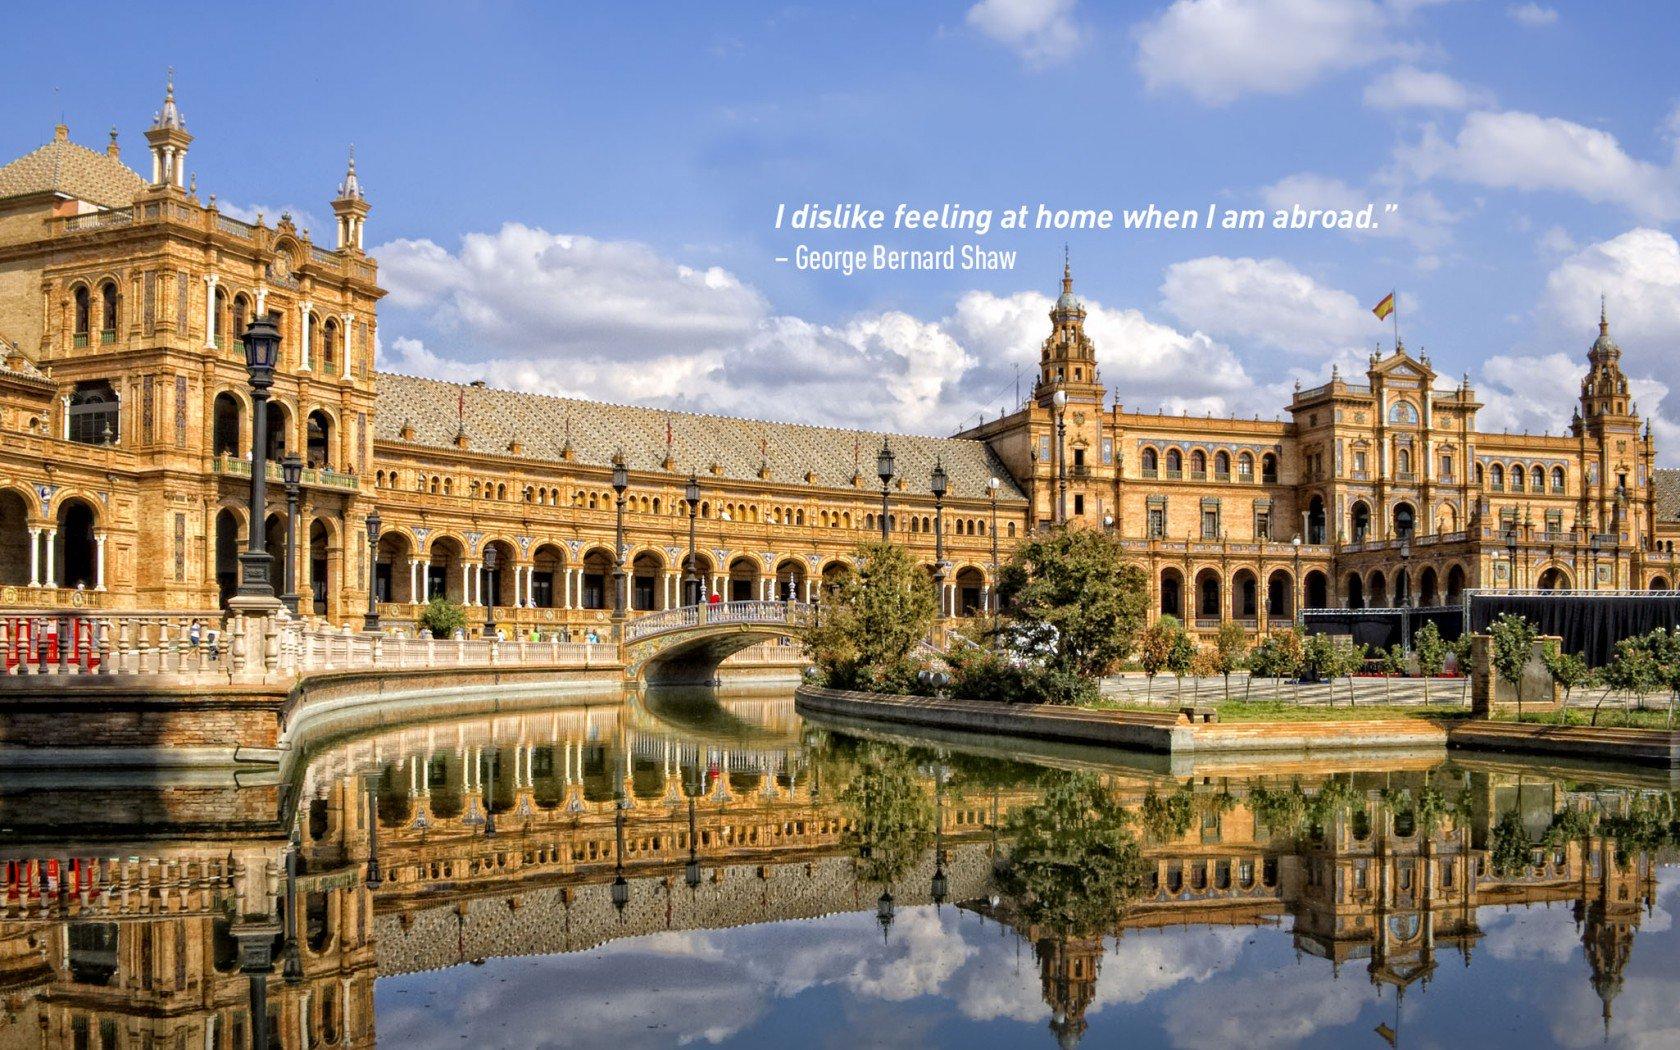 Citation de voyage de George Bernard Shaw. Plaza de España, Séville.